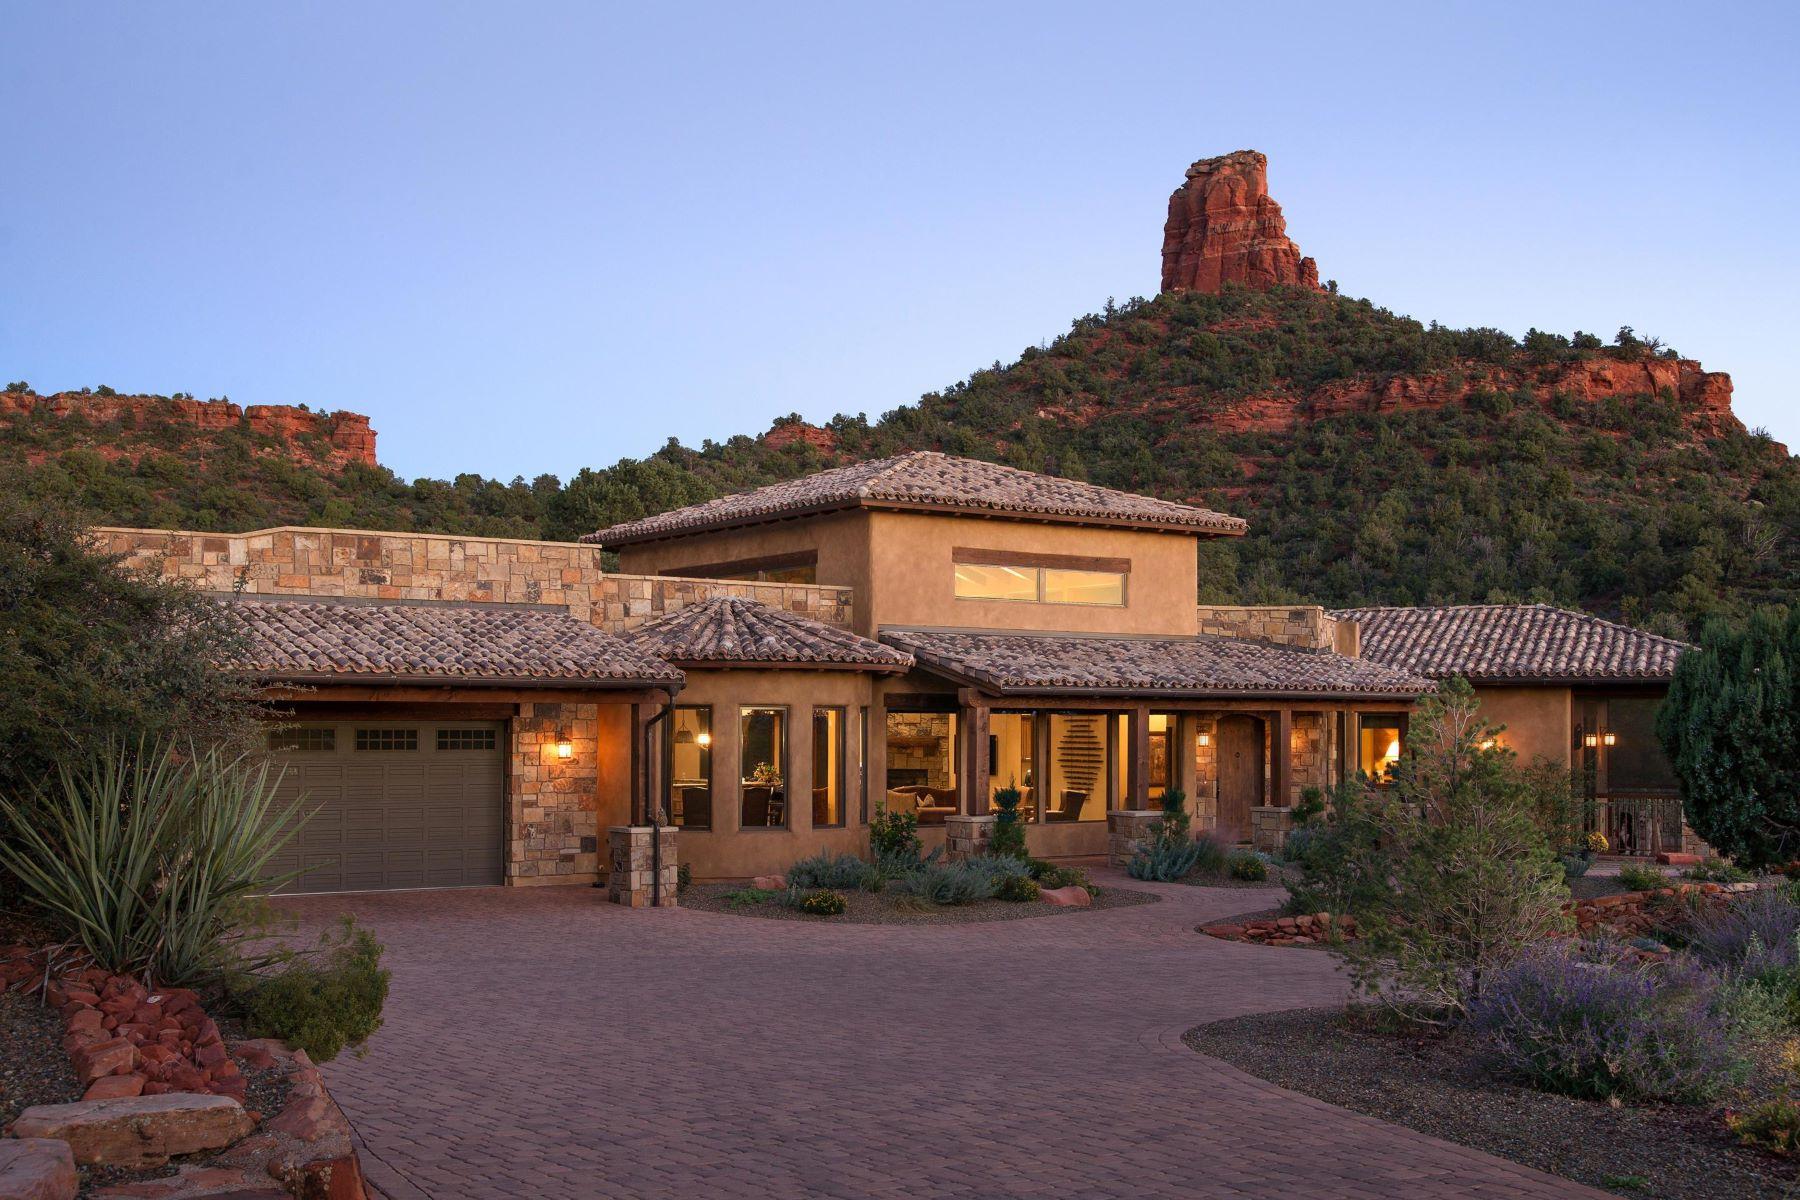 Single Family Homes για την Πώληση στο 3165 Lizard Head Lane, Sedona, AZ 86336 Sedona, Αριζονα 86336 Ηνωμένες Πολιτείες